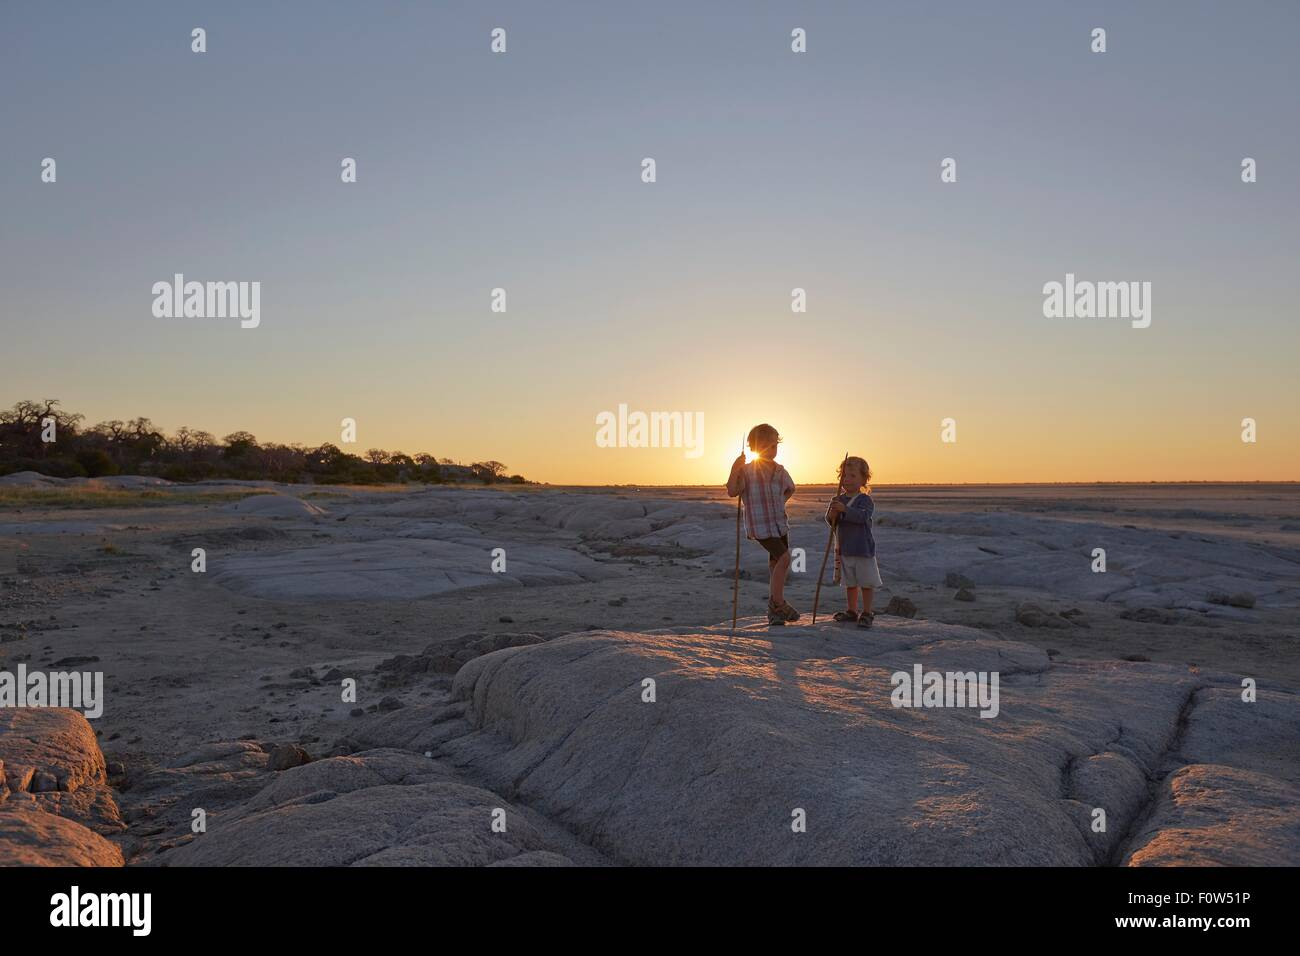 Two boys standing on rock, holding spear, sunset, Gweta, makgadikgadi, Botswana Stock Photo